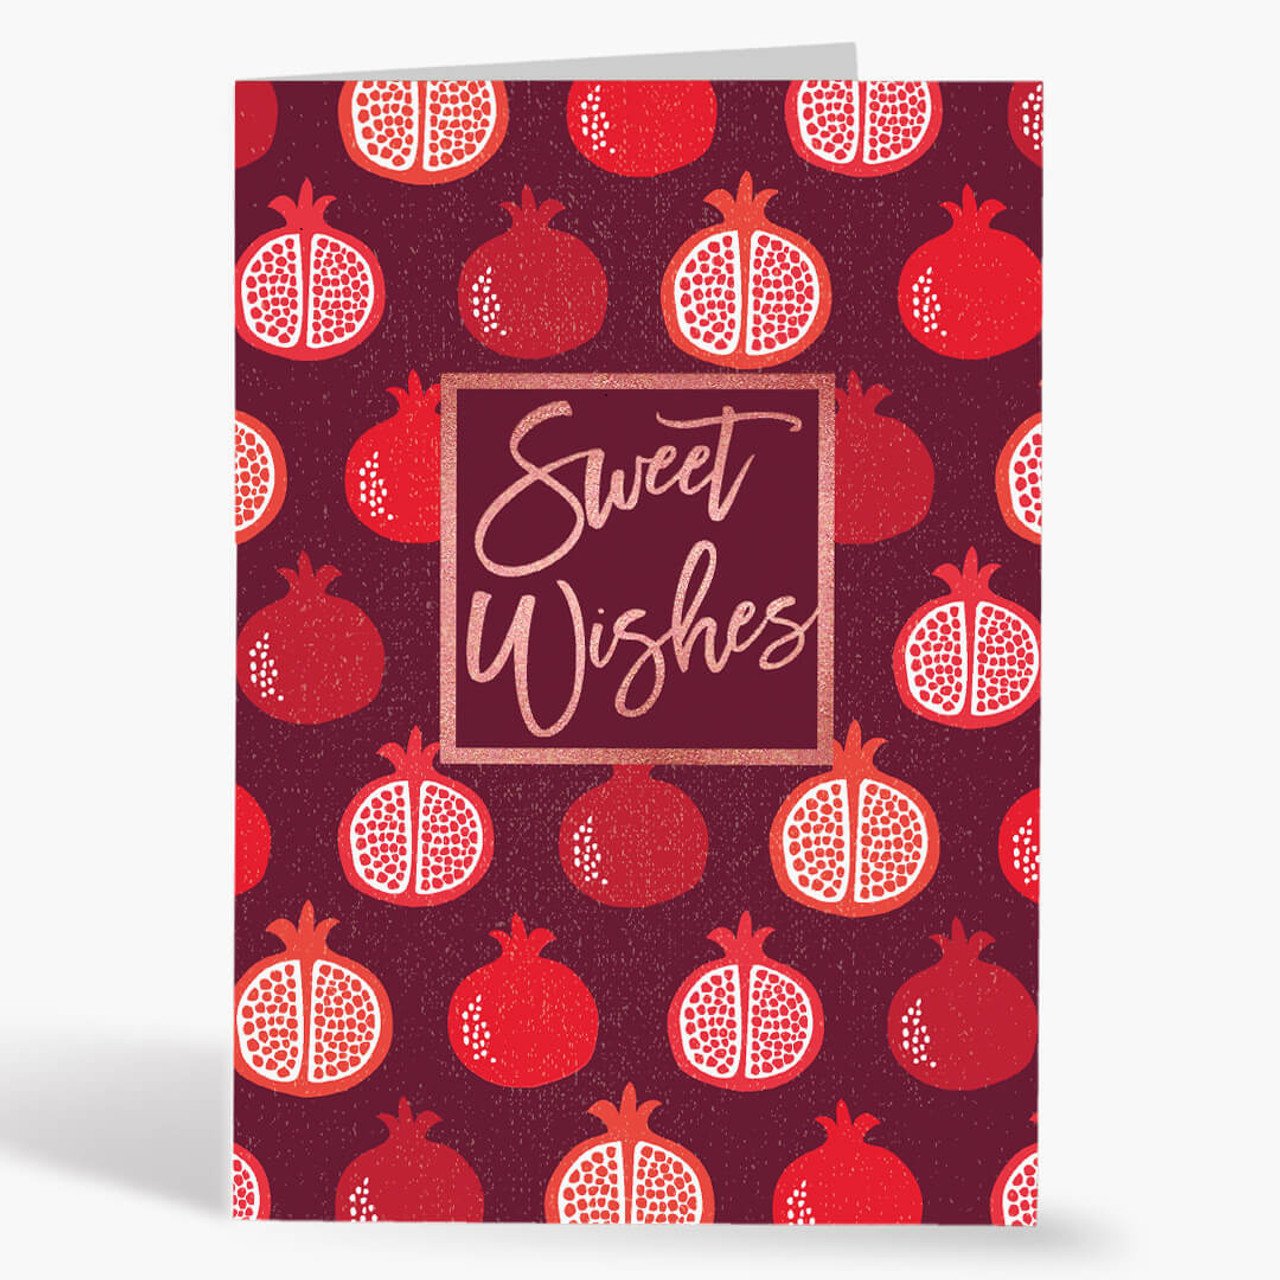 Pomegranate Wishes